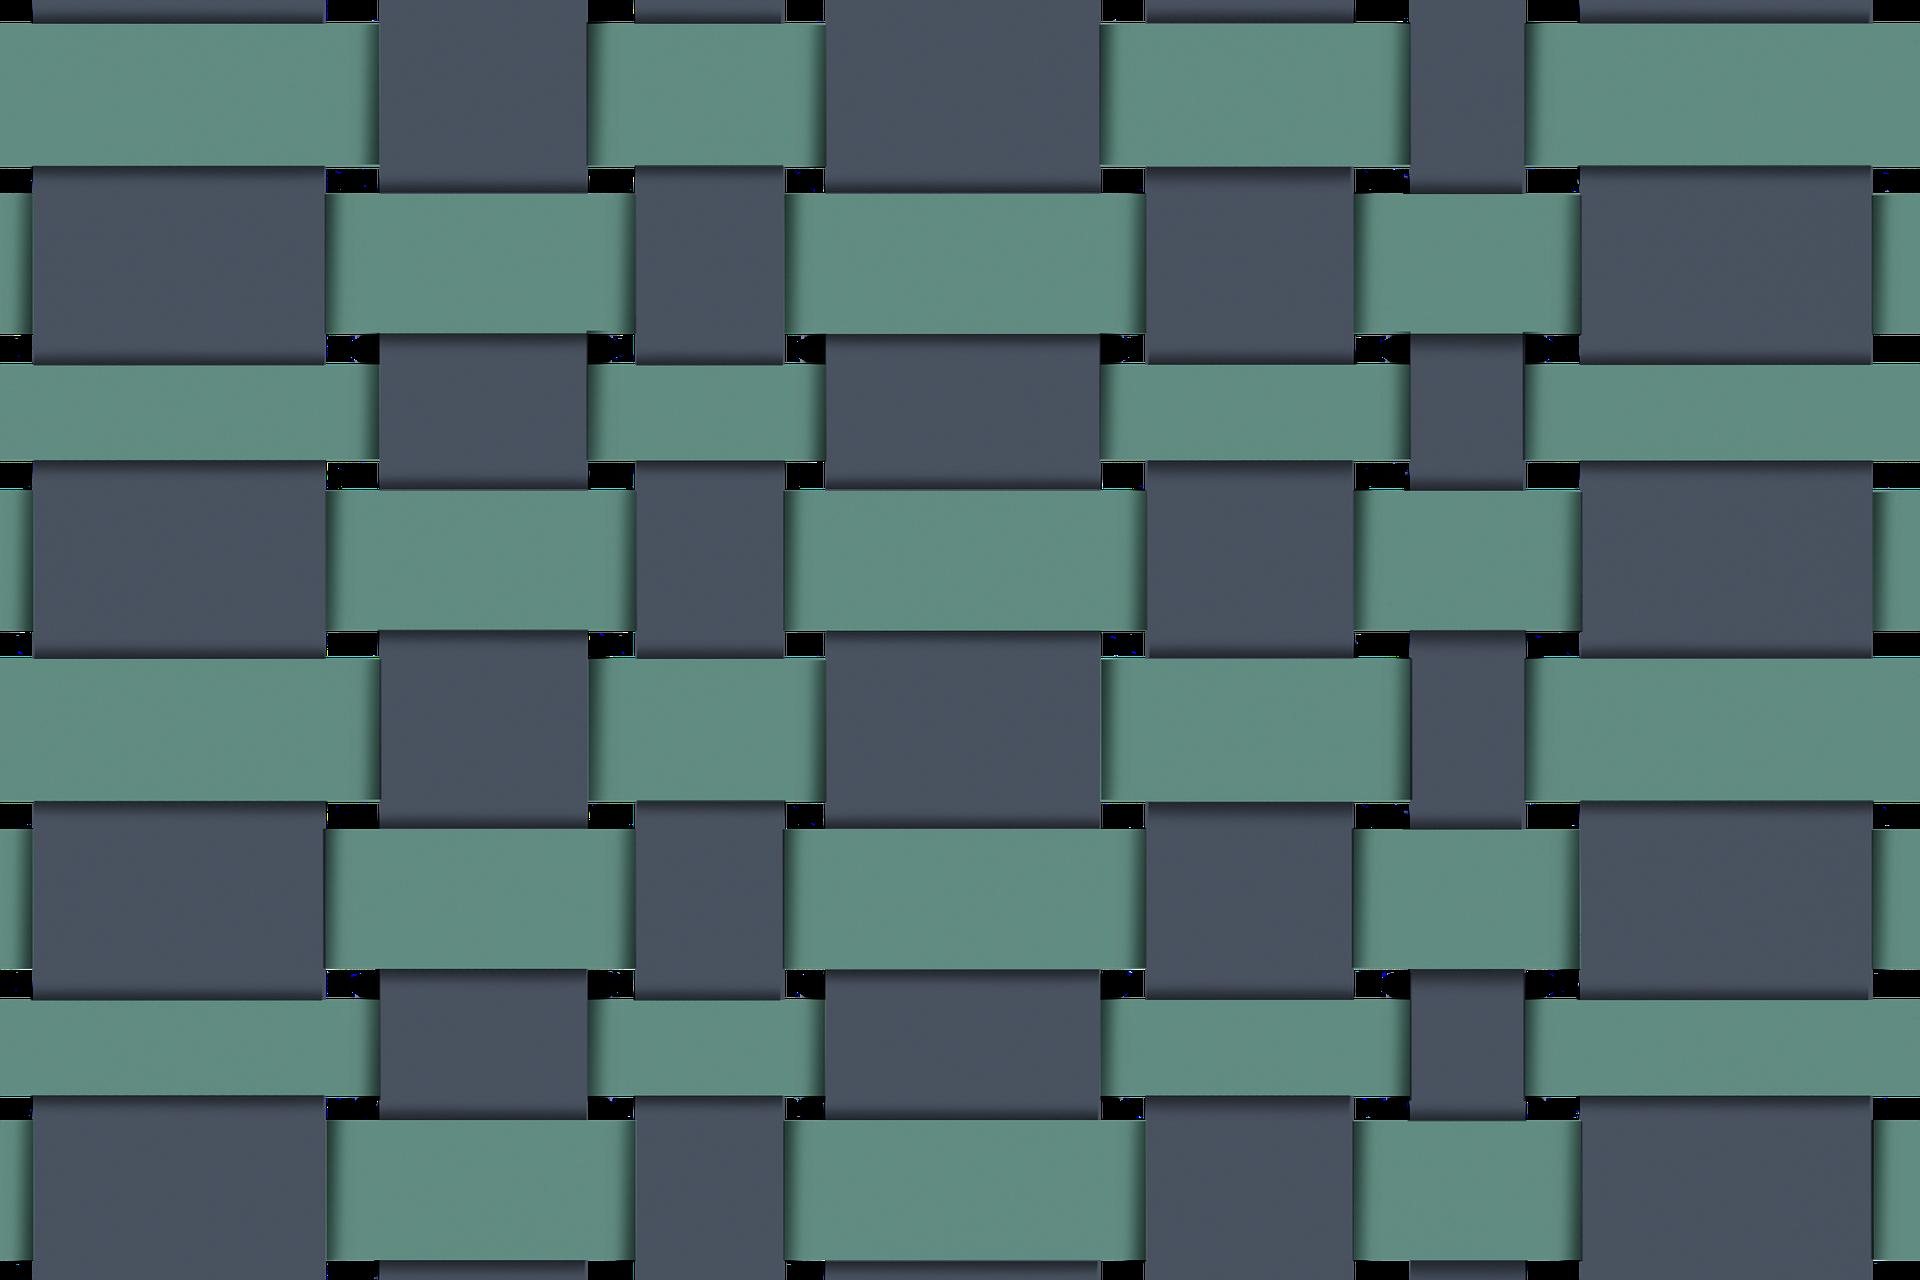 Block Texture, Block, Design, Texture, Urban, HQ Photo